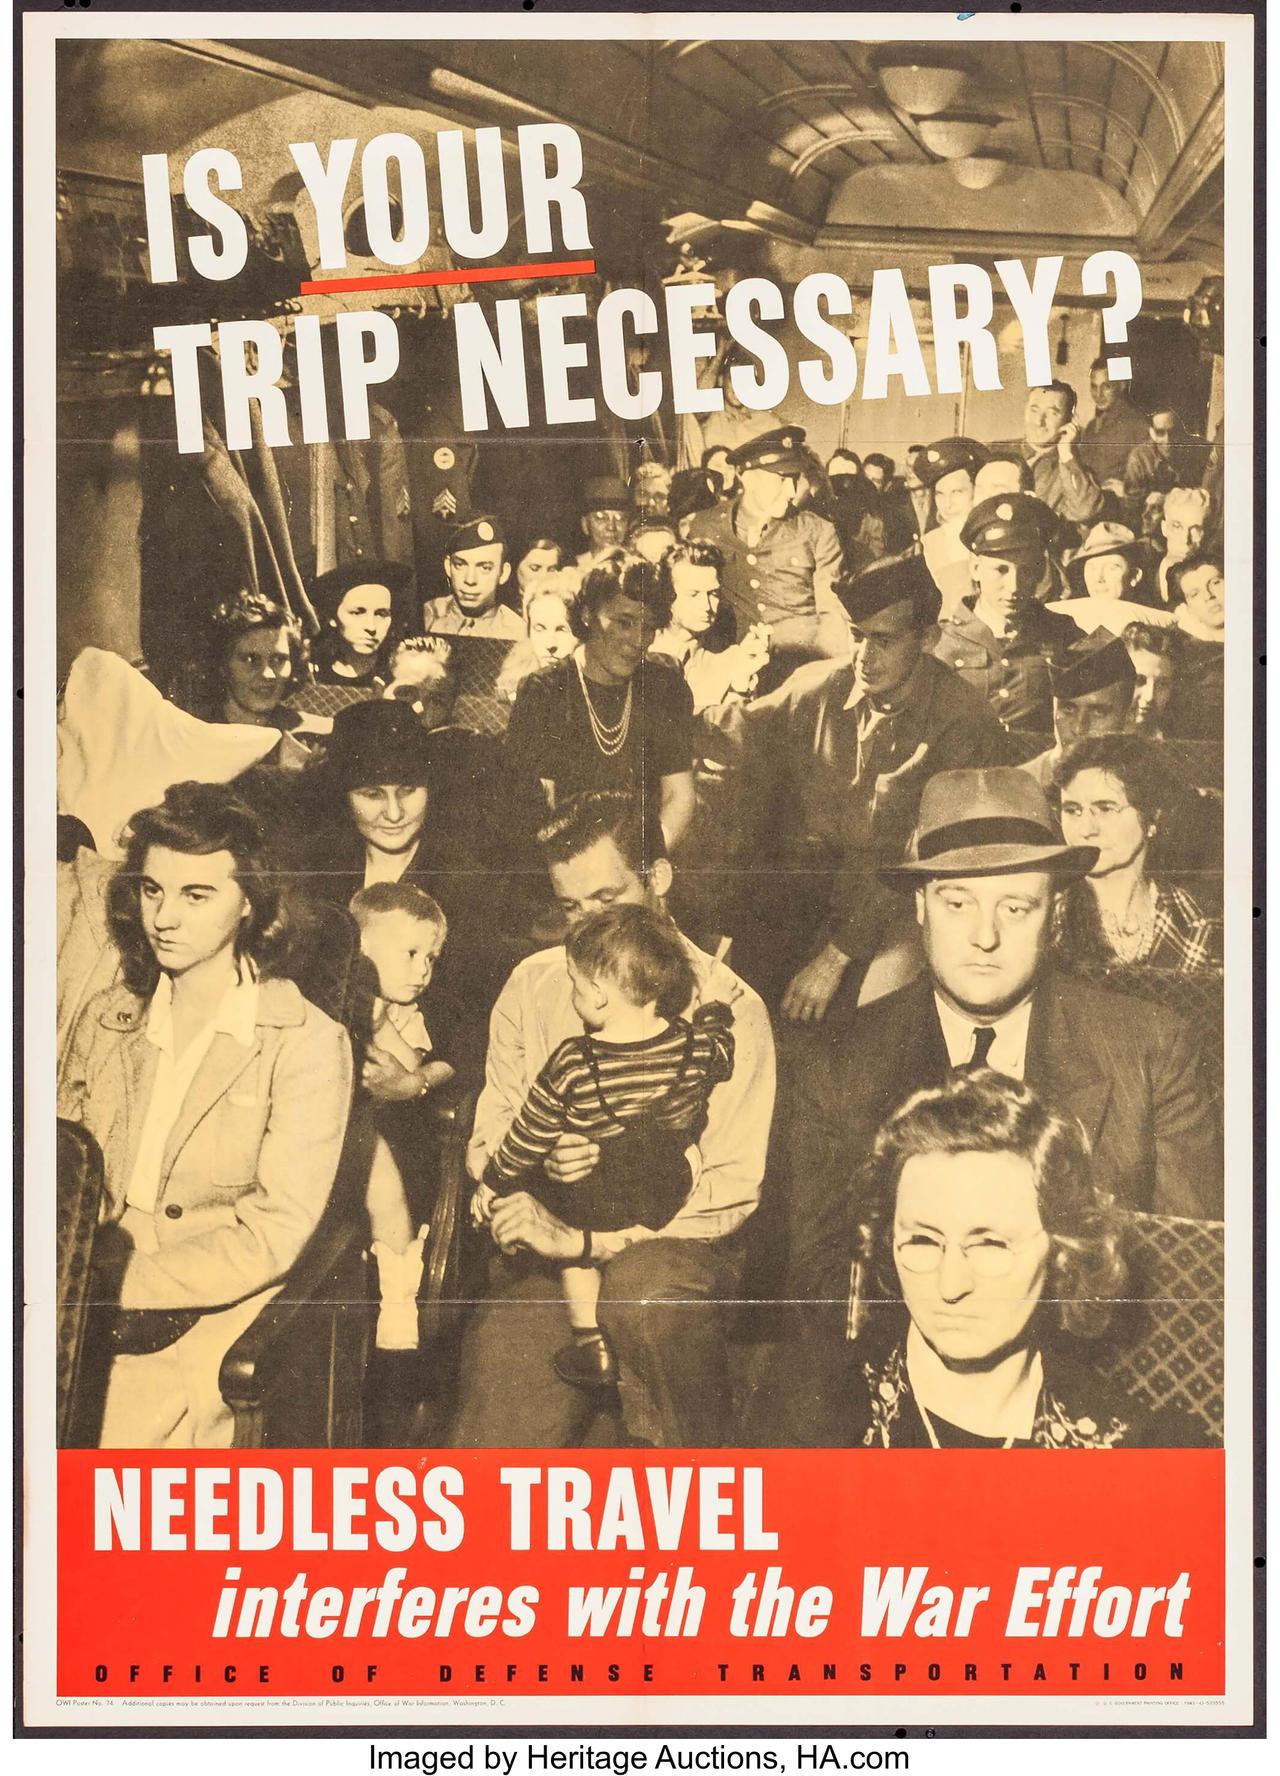 World War II is your trip necessary